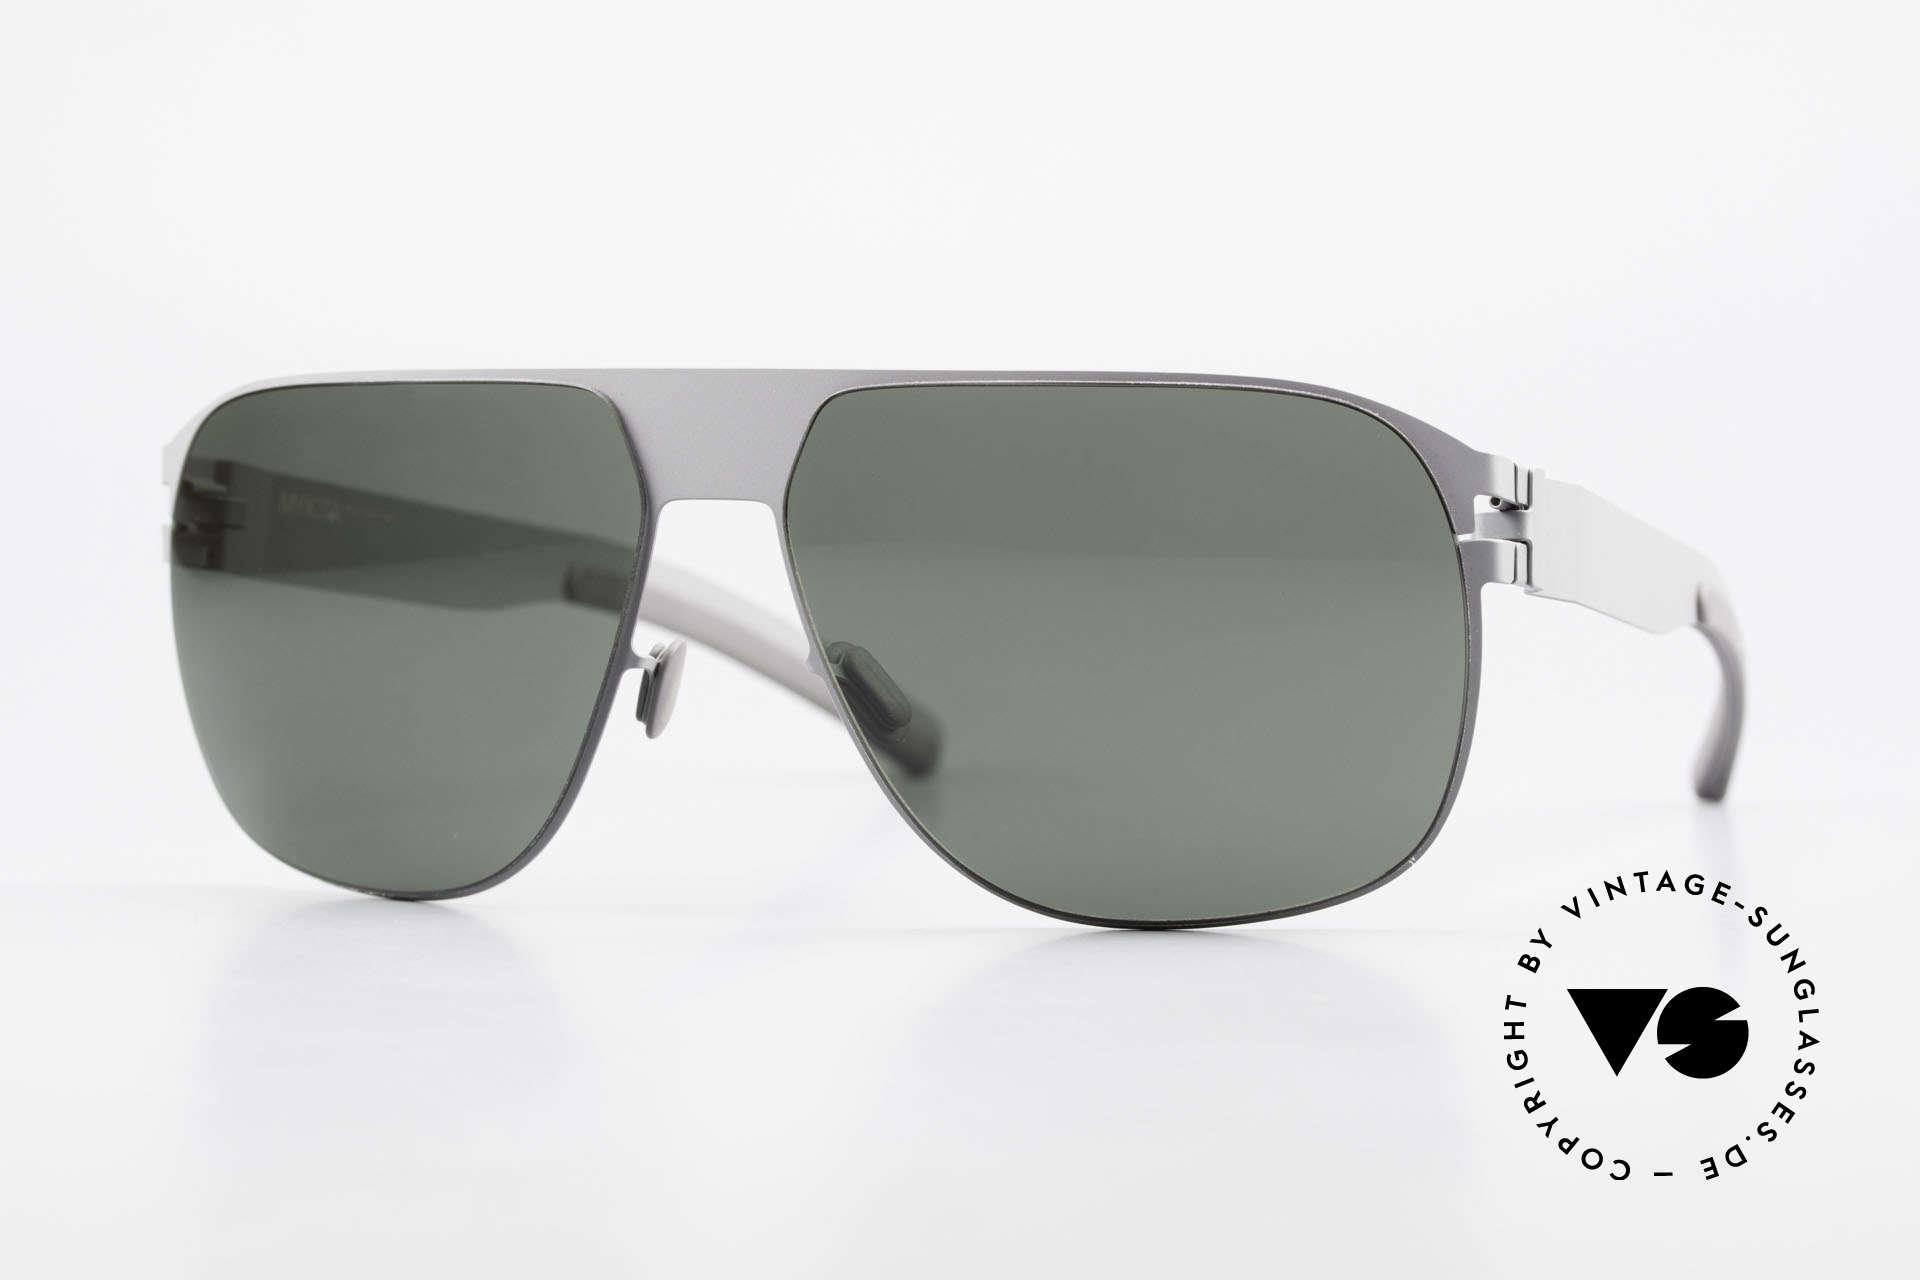 Mykita Tim Mykita Shades Vintage 2011's, original VINTAGE Mykita designer sunglasses from 2011, Made for Men